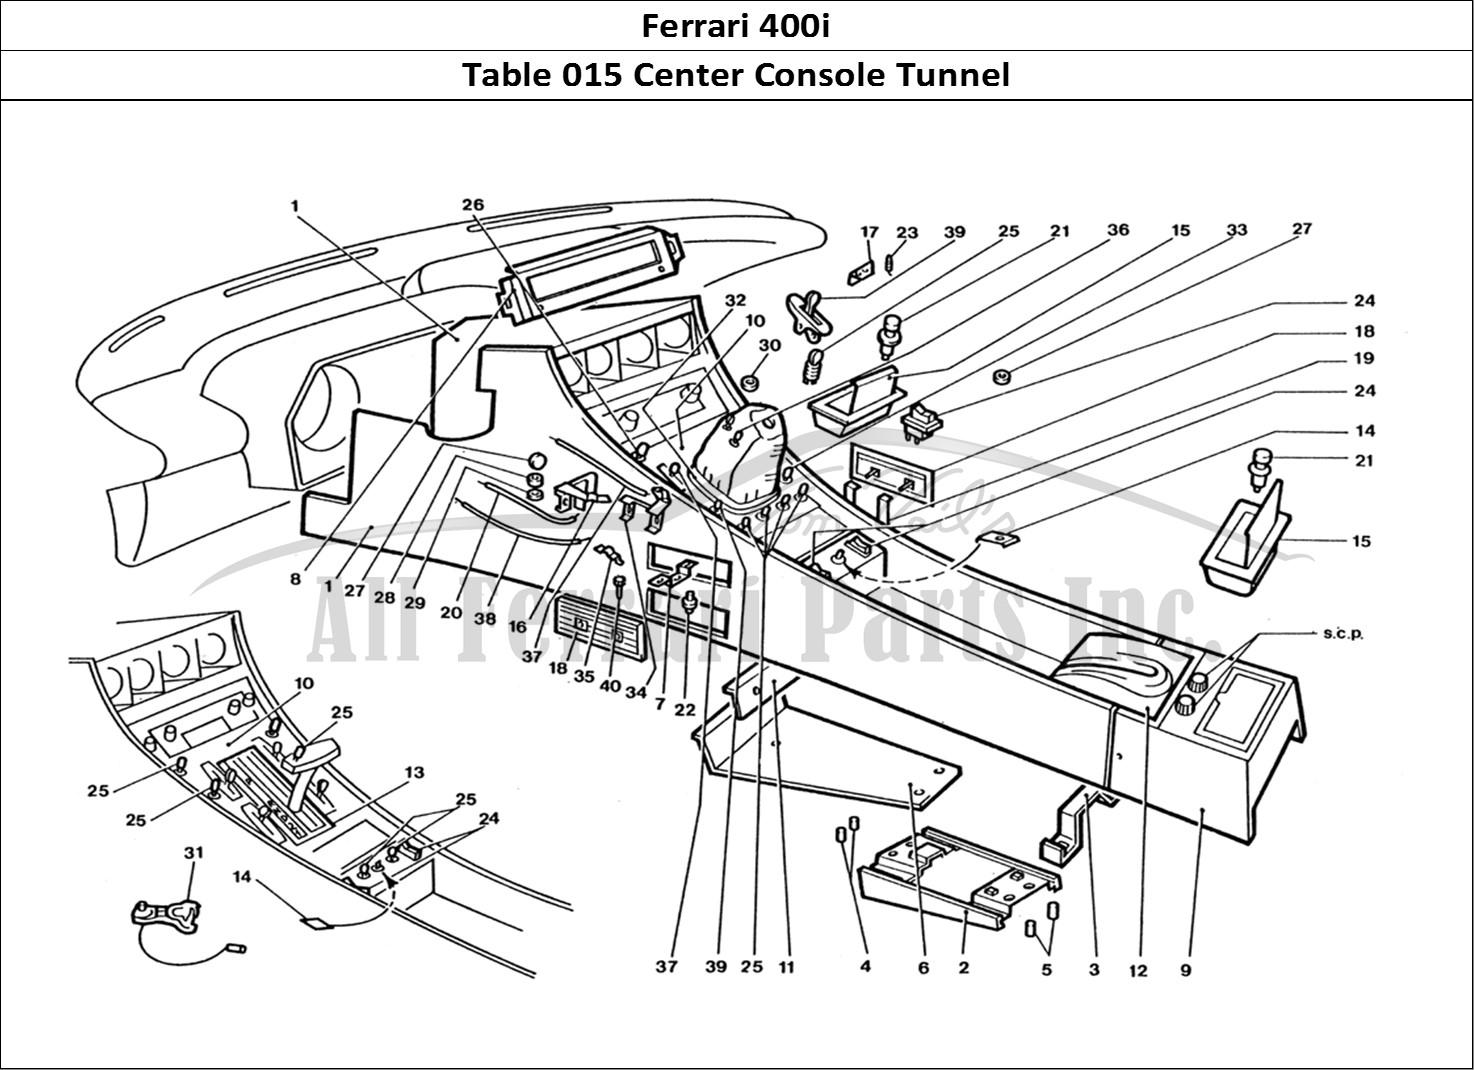 Buy Original Ferrari 400i 015 Center Console Tunnel Ferrari Parts Spares Accessories Online